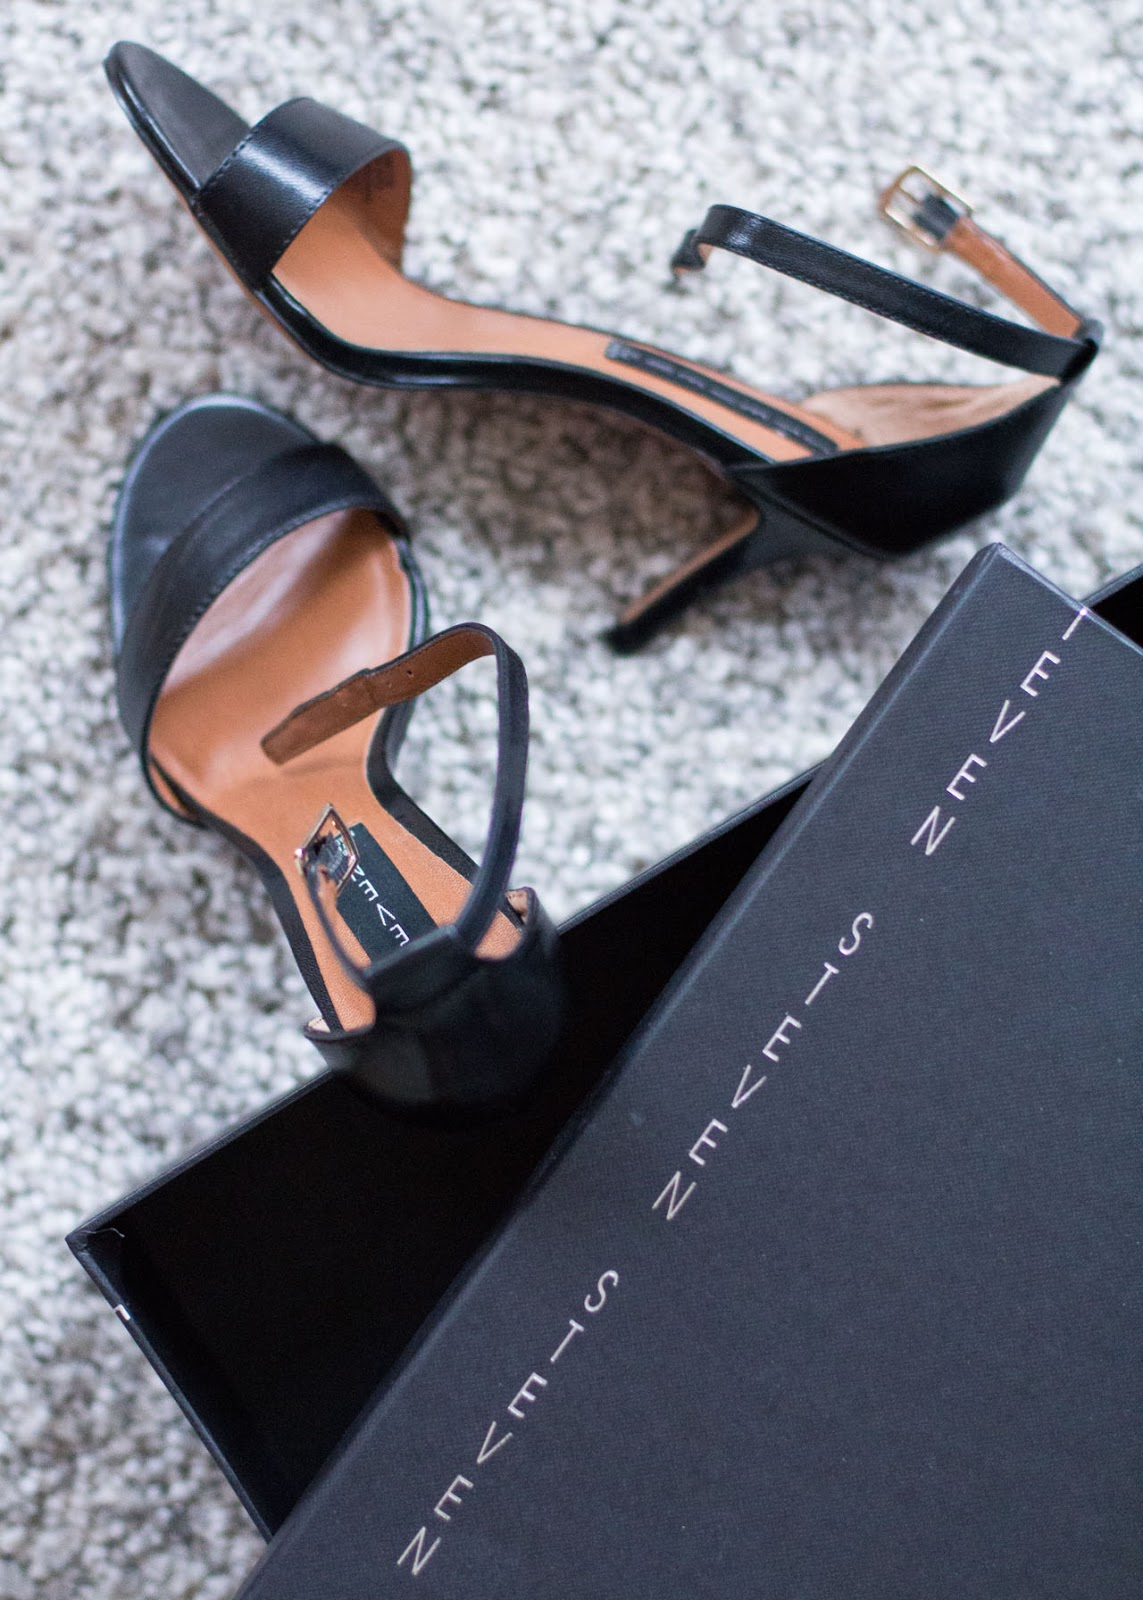 new Steven shoes - heels - Scandinavian - Canadian Fashion Blog